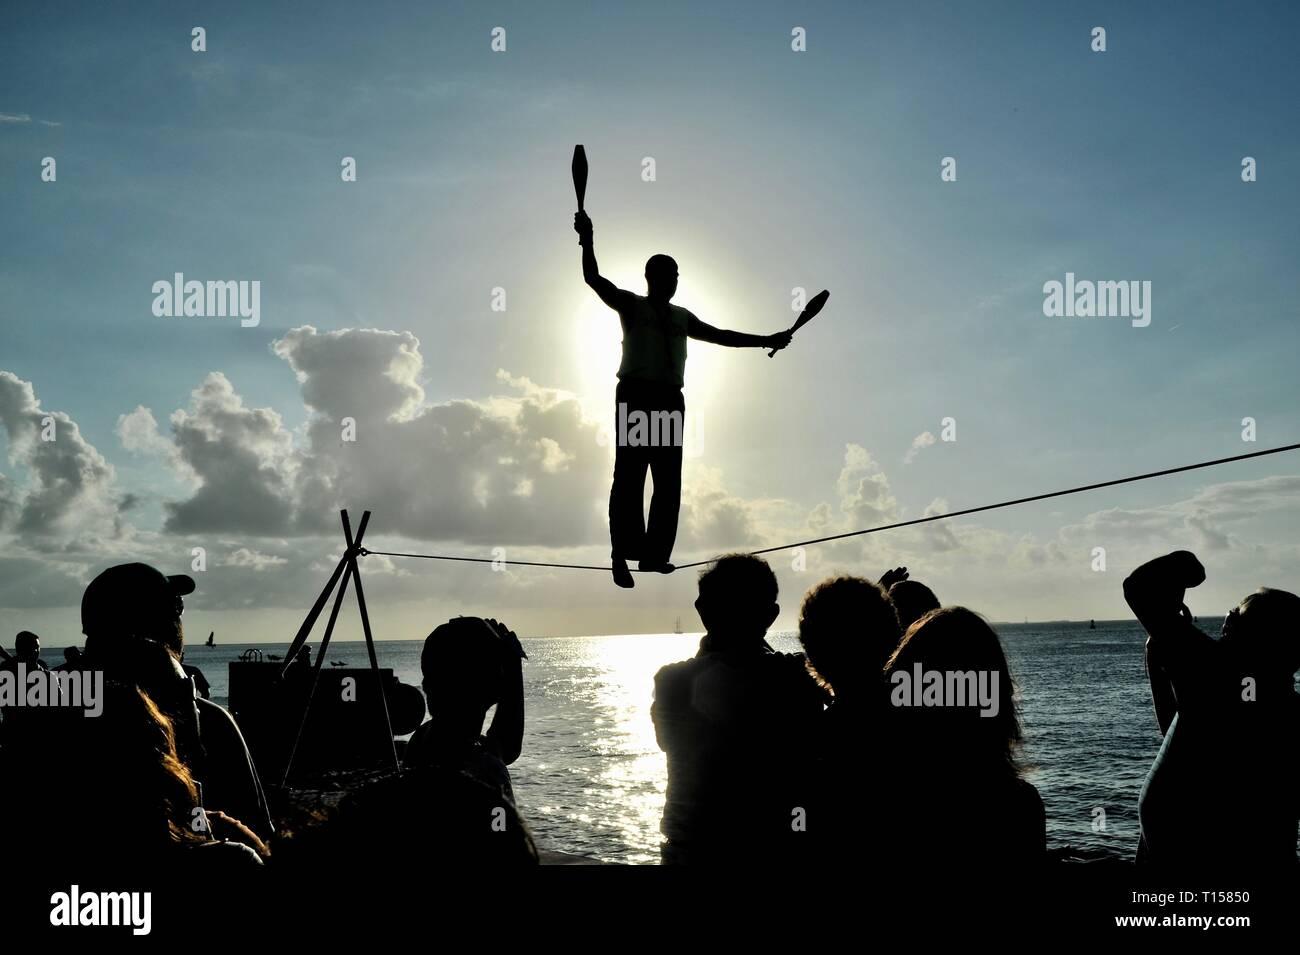 Male street performer balancing on tightrope while juggling, entertain crowds, Mallory Square Sunset Celebration, Key West, Florida Keys, Florida, USA Stock Photo